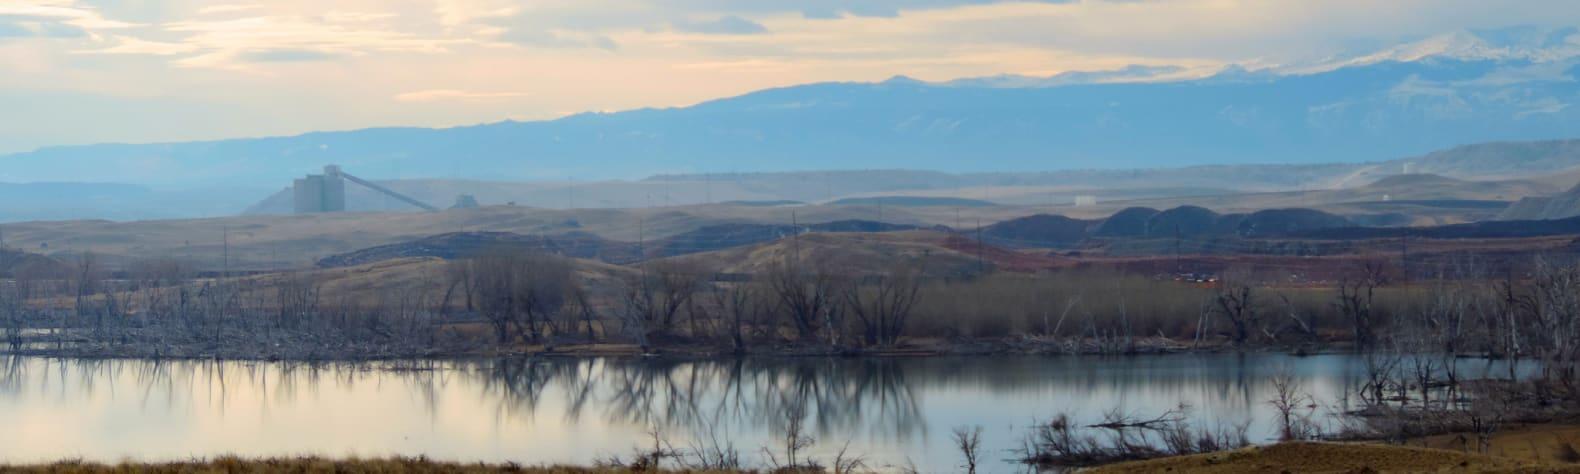 Tongue River Reservoir State Park